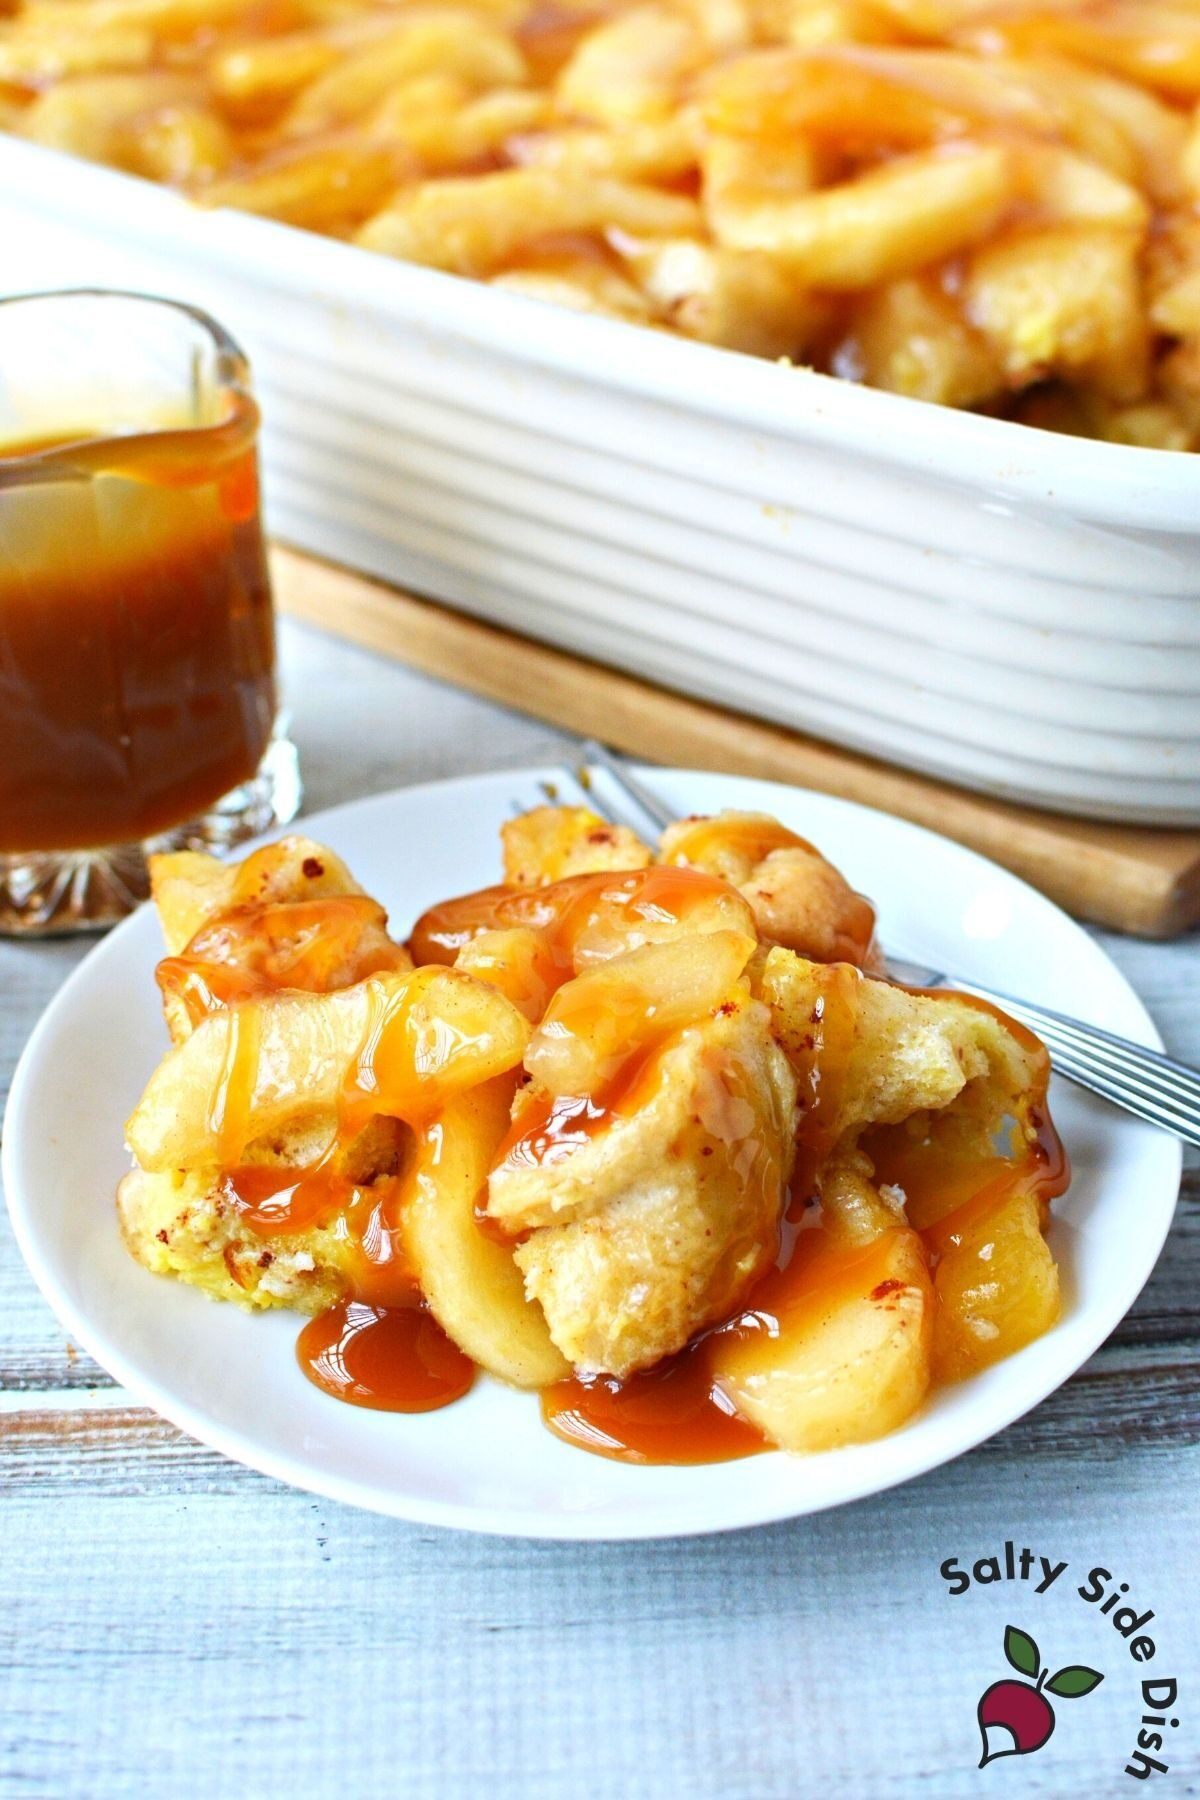 plate of apple pie breakfast bake with caramel sauce.